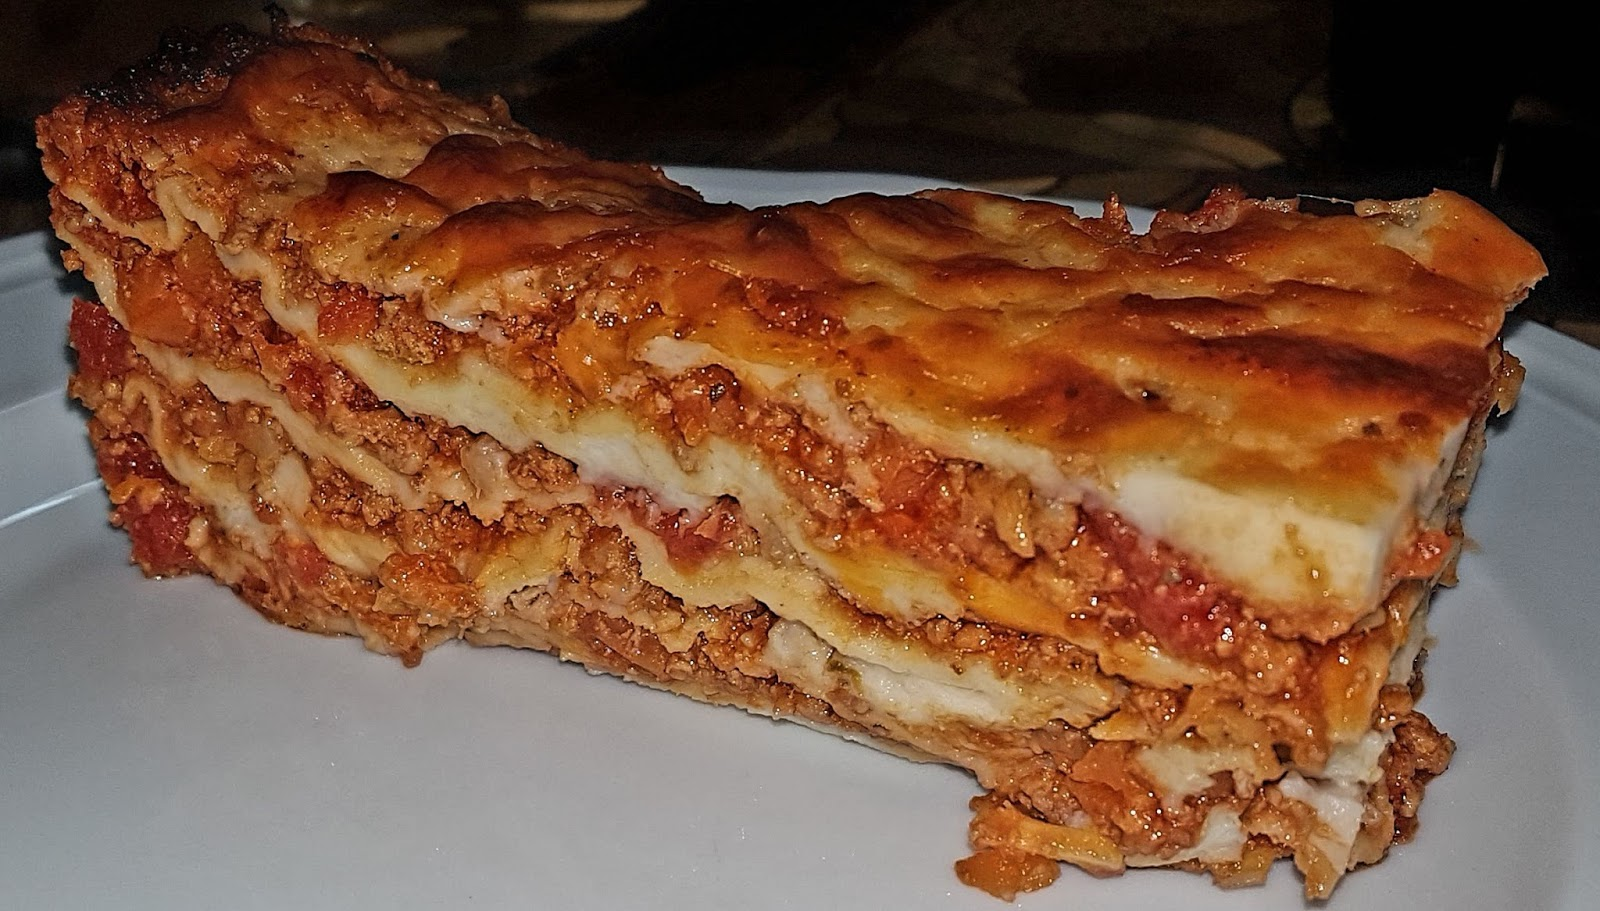 Ricetta Lasagne Kenwood.La Cucina Di Fata Sprint Lasagne Veloci Con Kenwood Cooking Chef